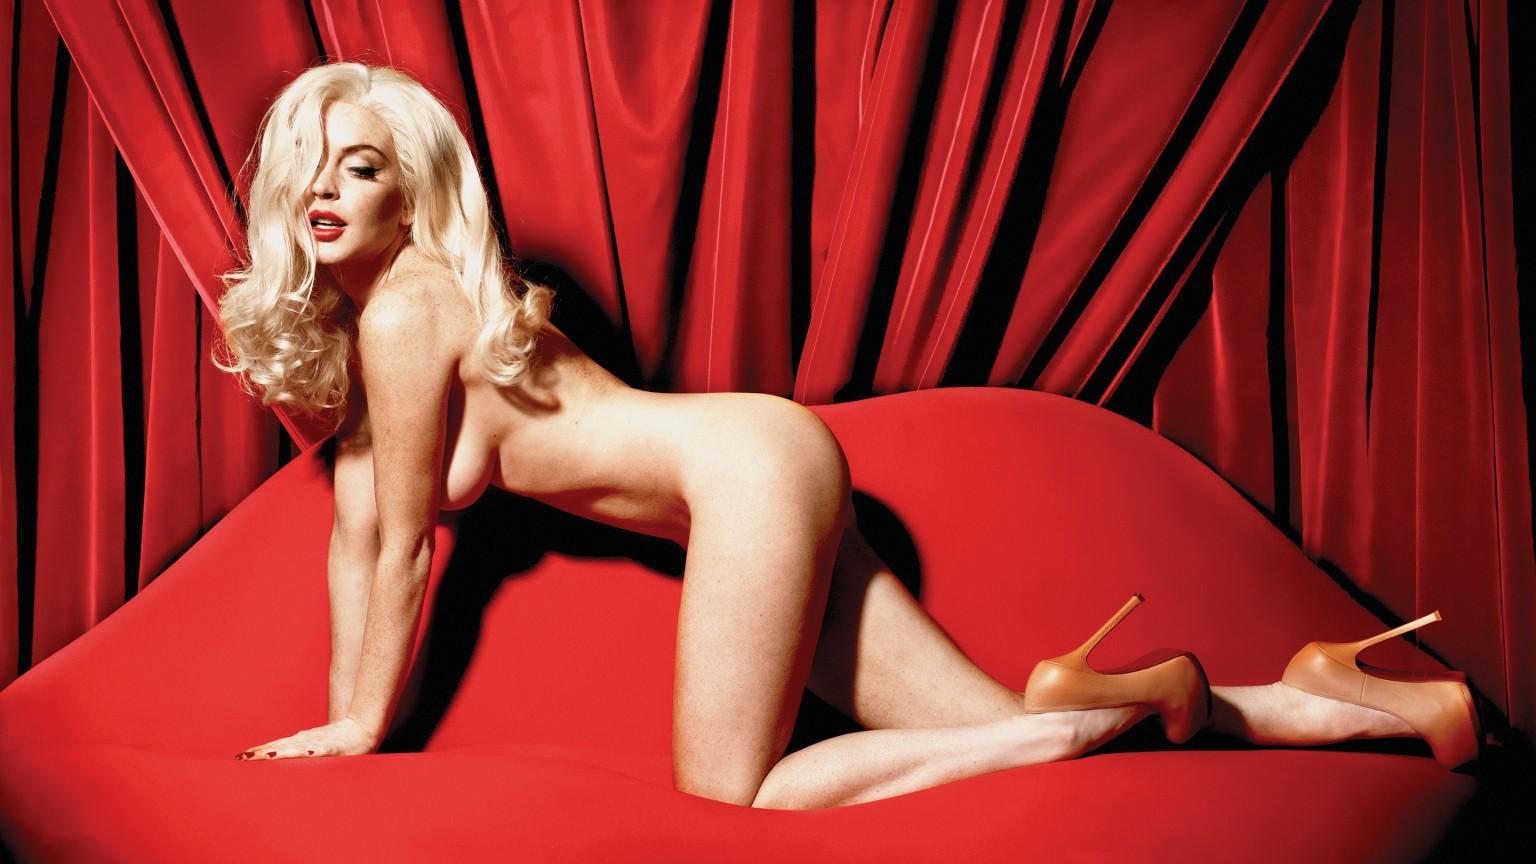 Lindsay Lohan Channels Marilyn